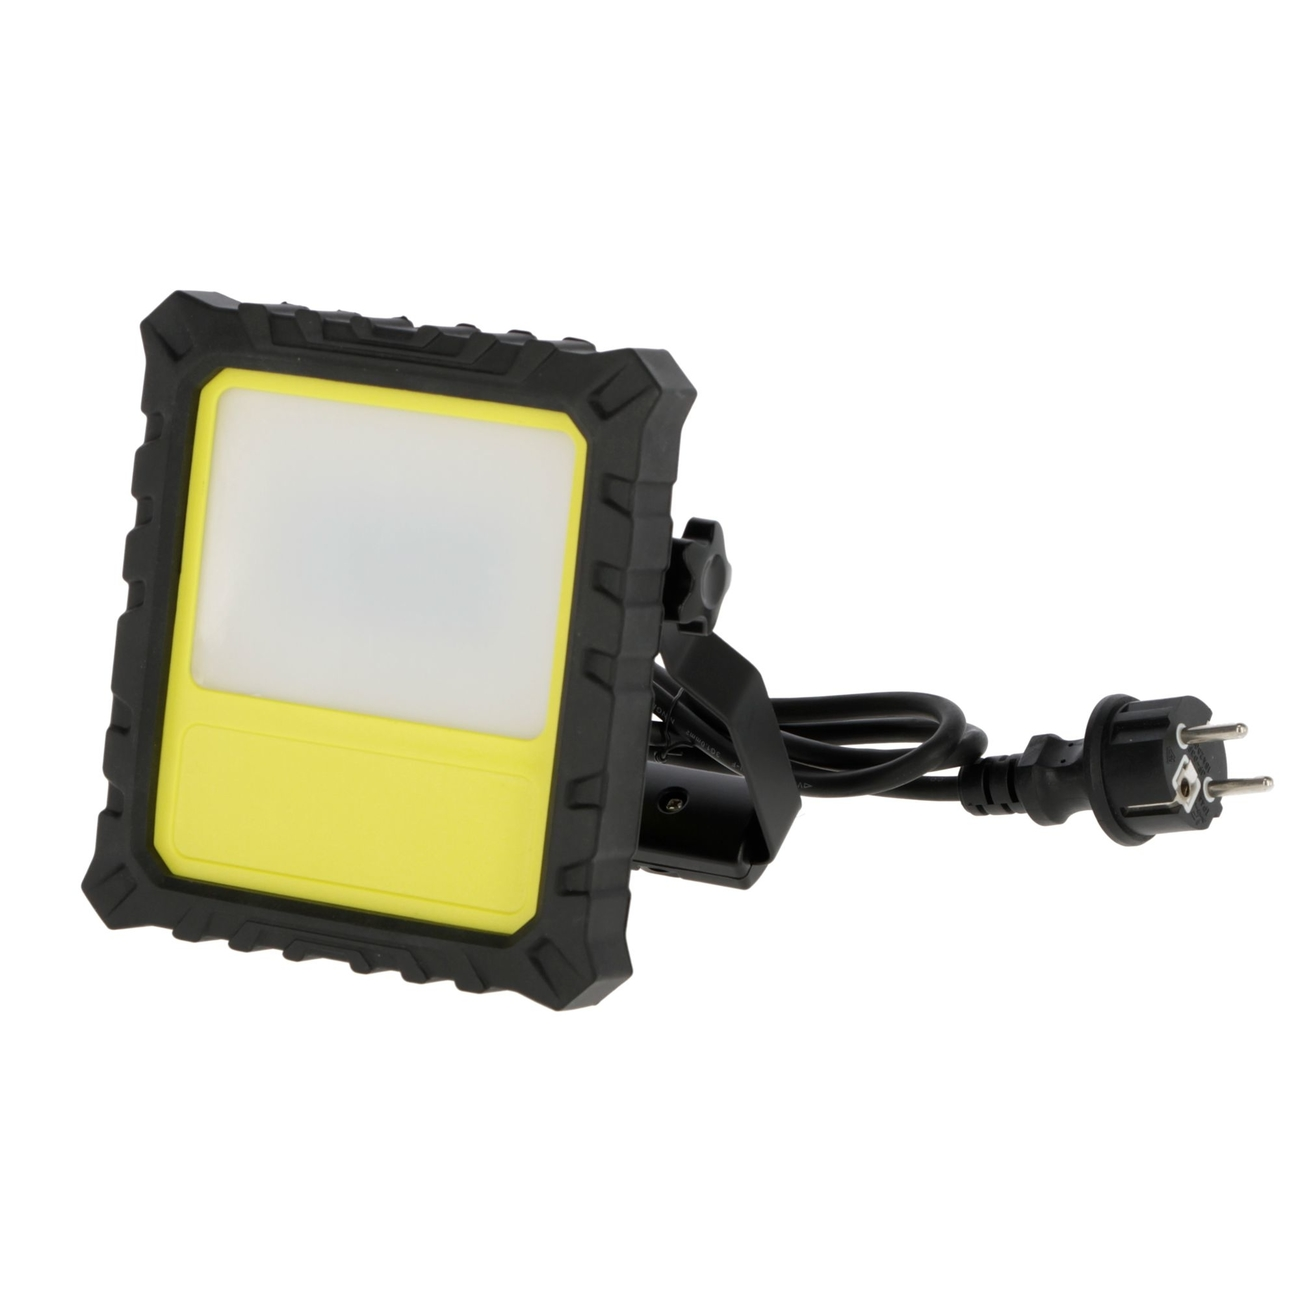 Kerbl Mobiler LED Akku Strahler WorkFire Pro, Bild 3